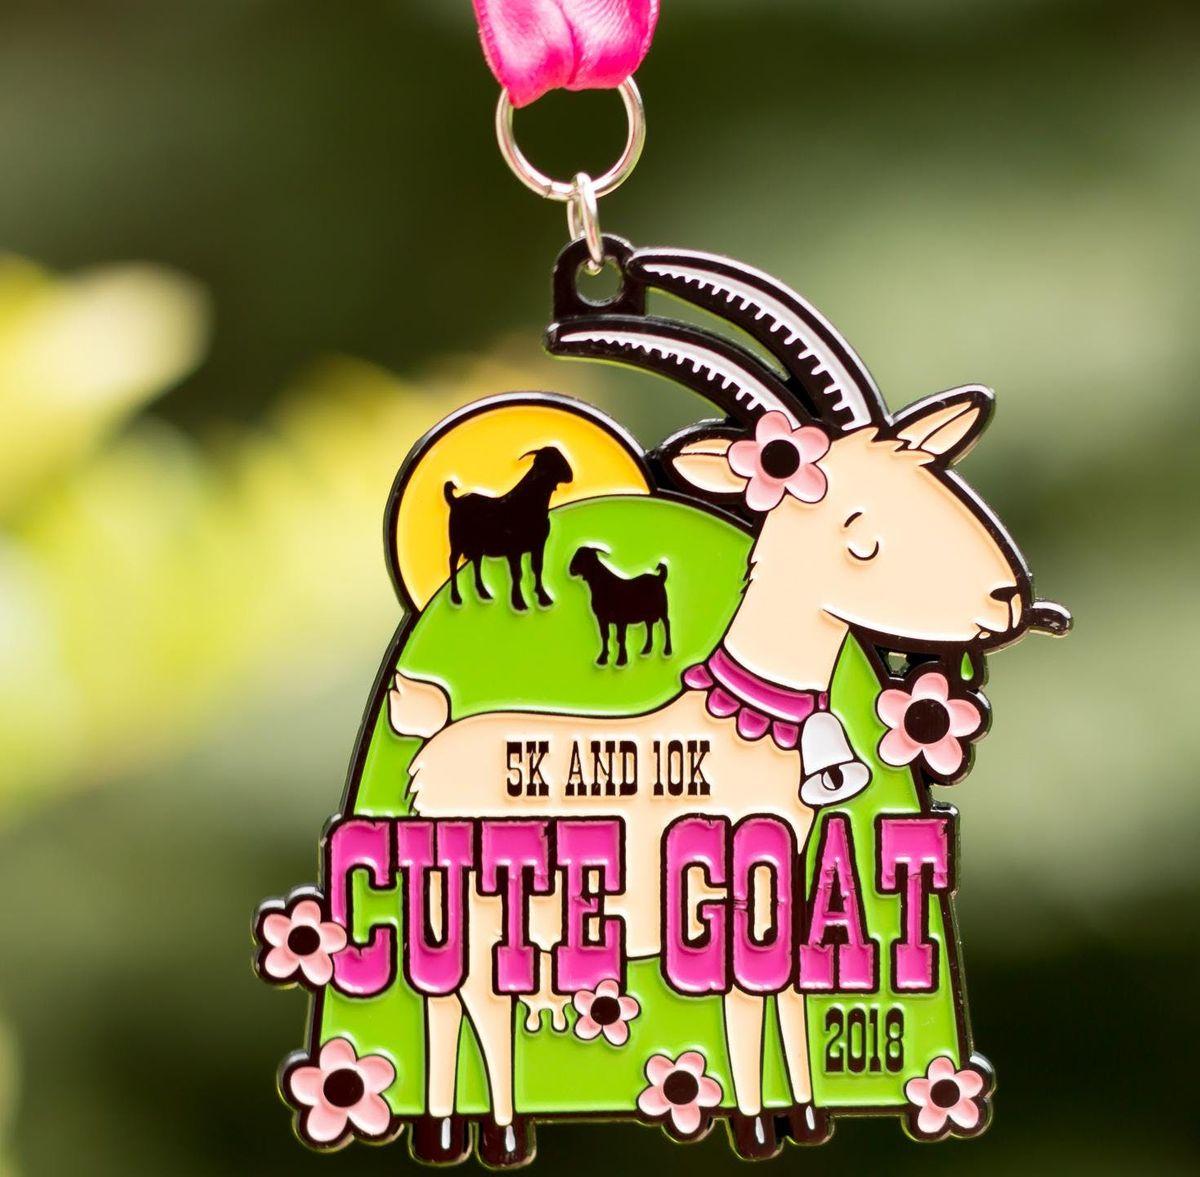 Now Only 10 Cute Goat 5K & 10K - Anaheim